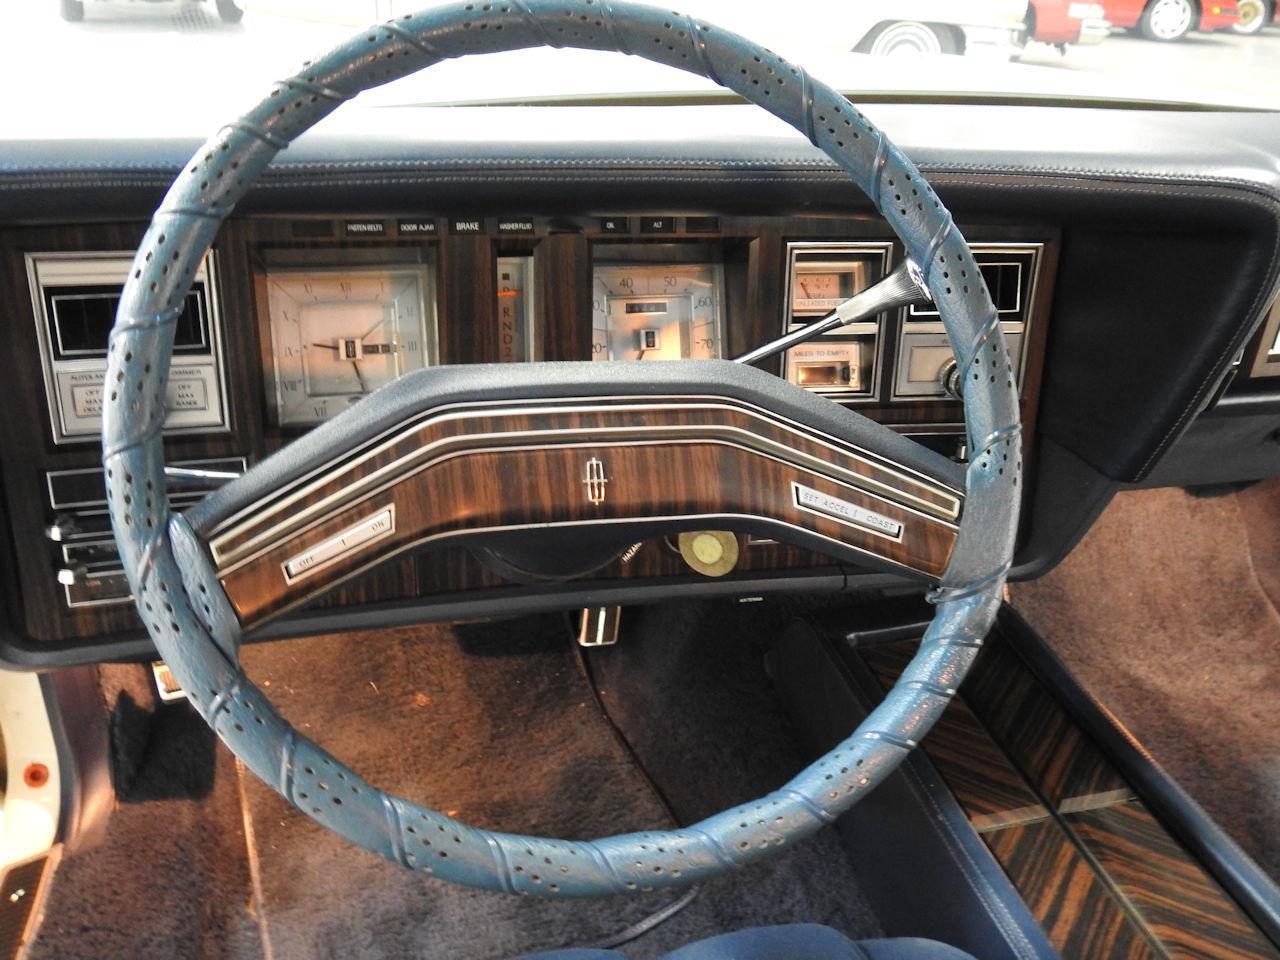 1979 Lincoln MKV 59